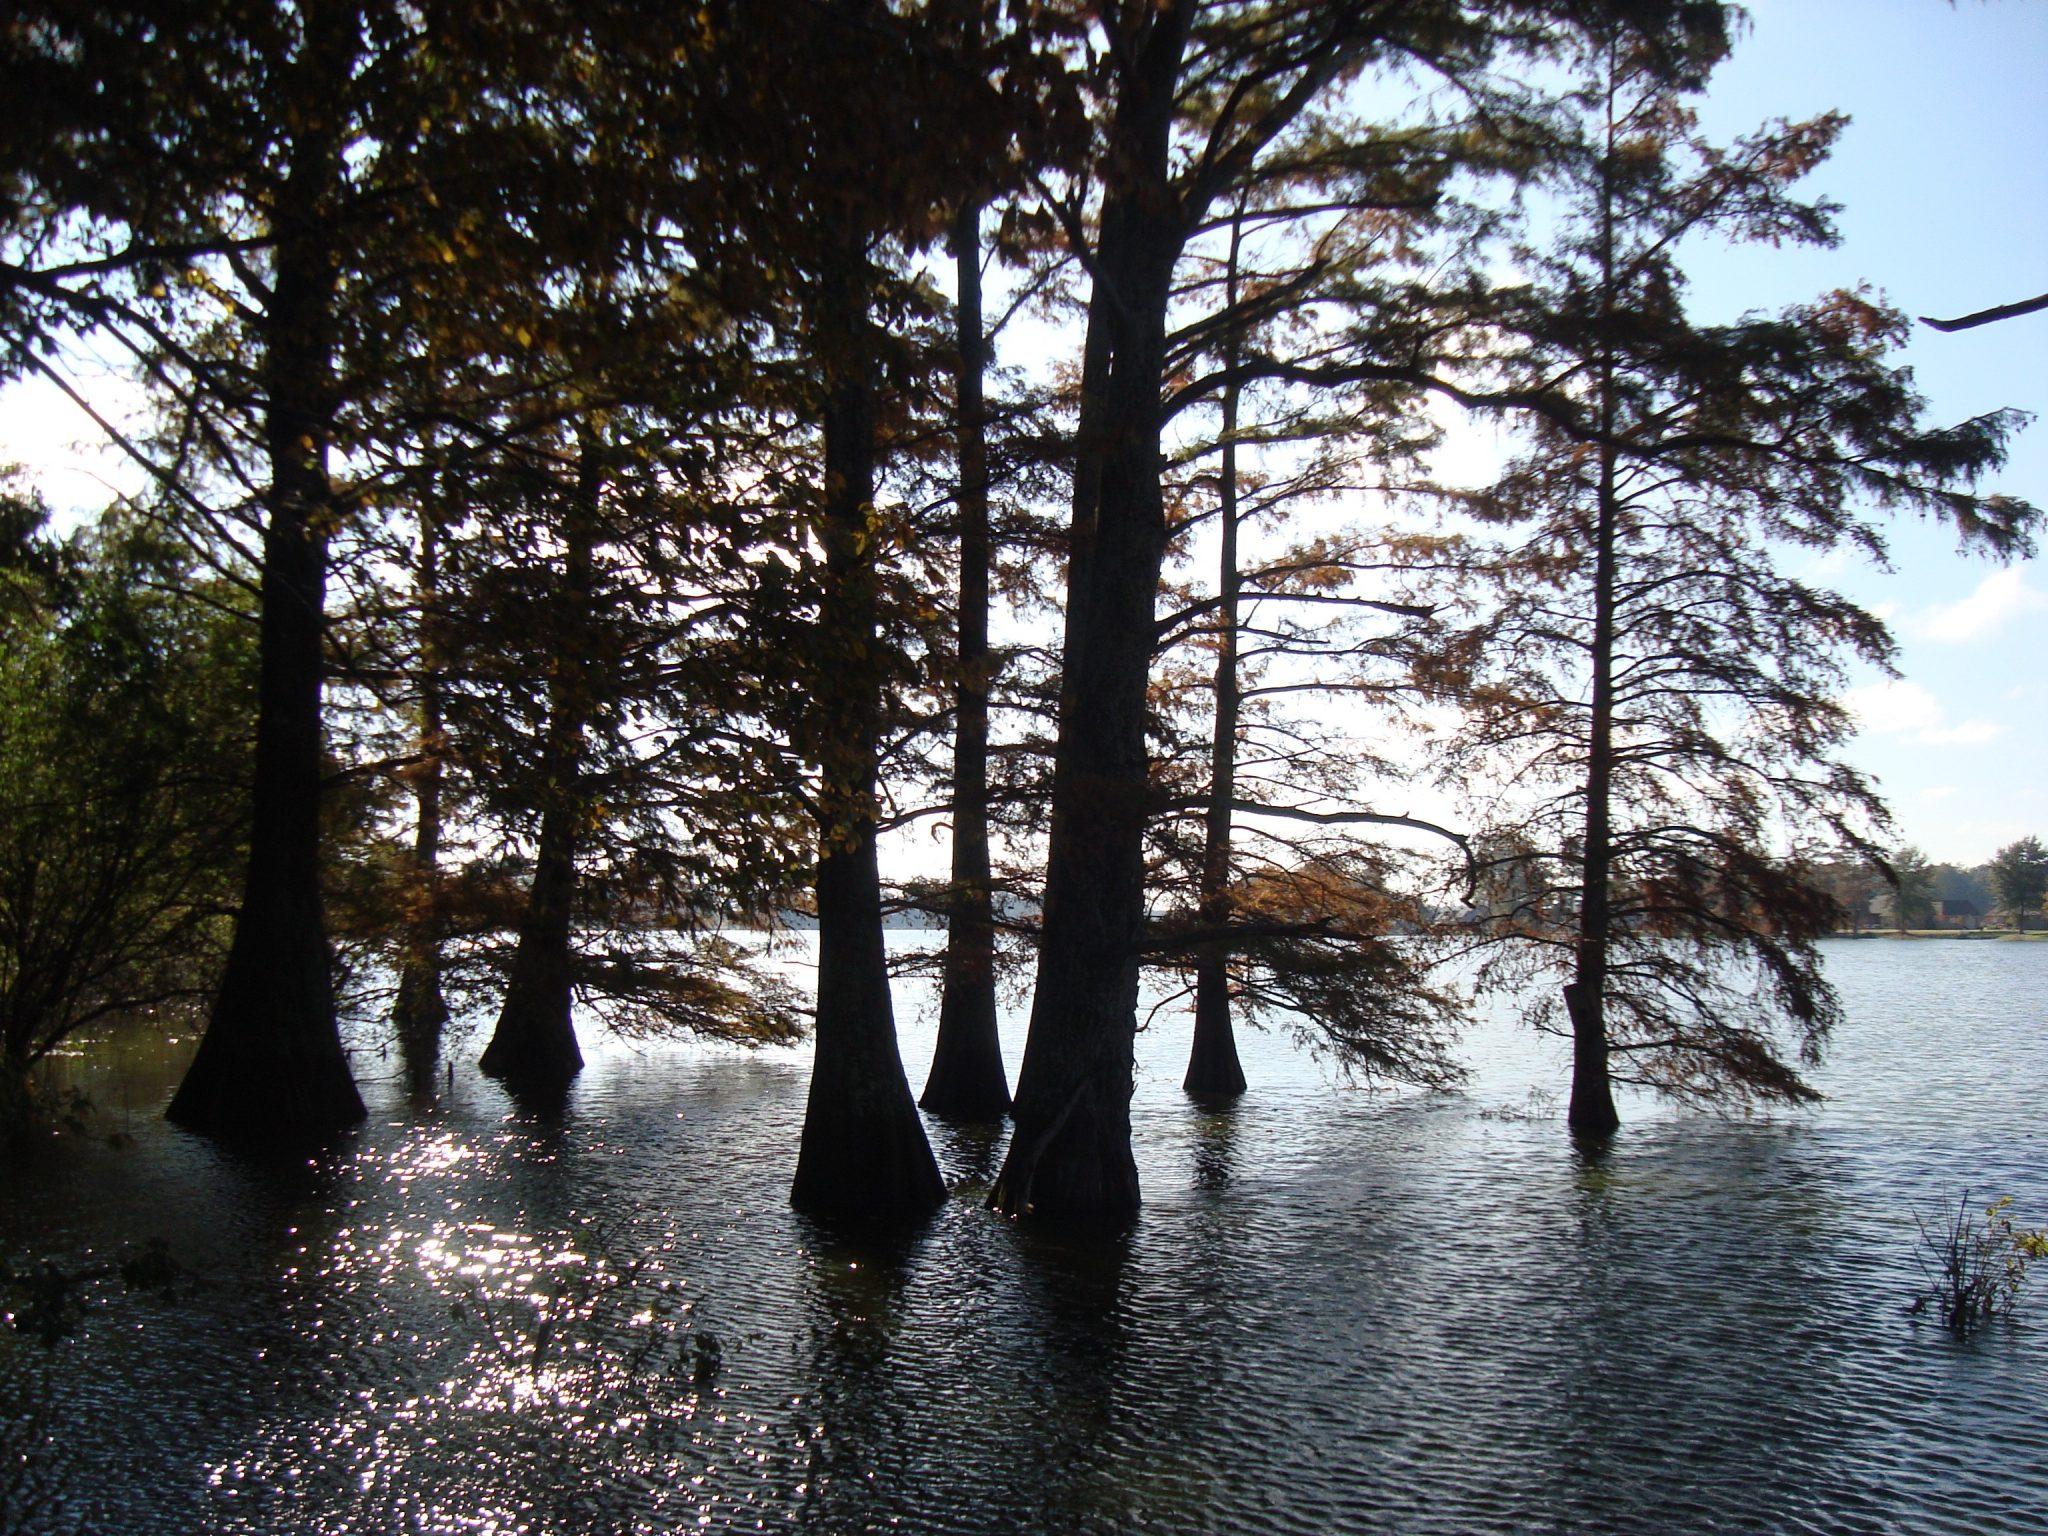 Cypress trees along Alabama River